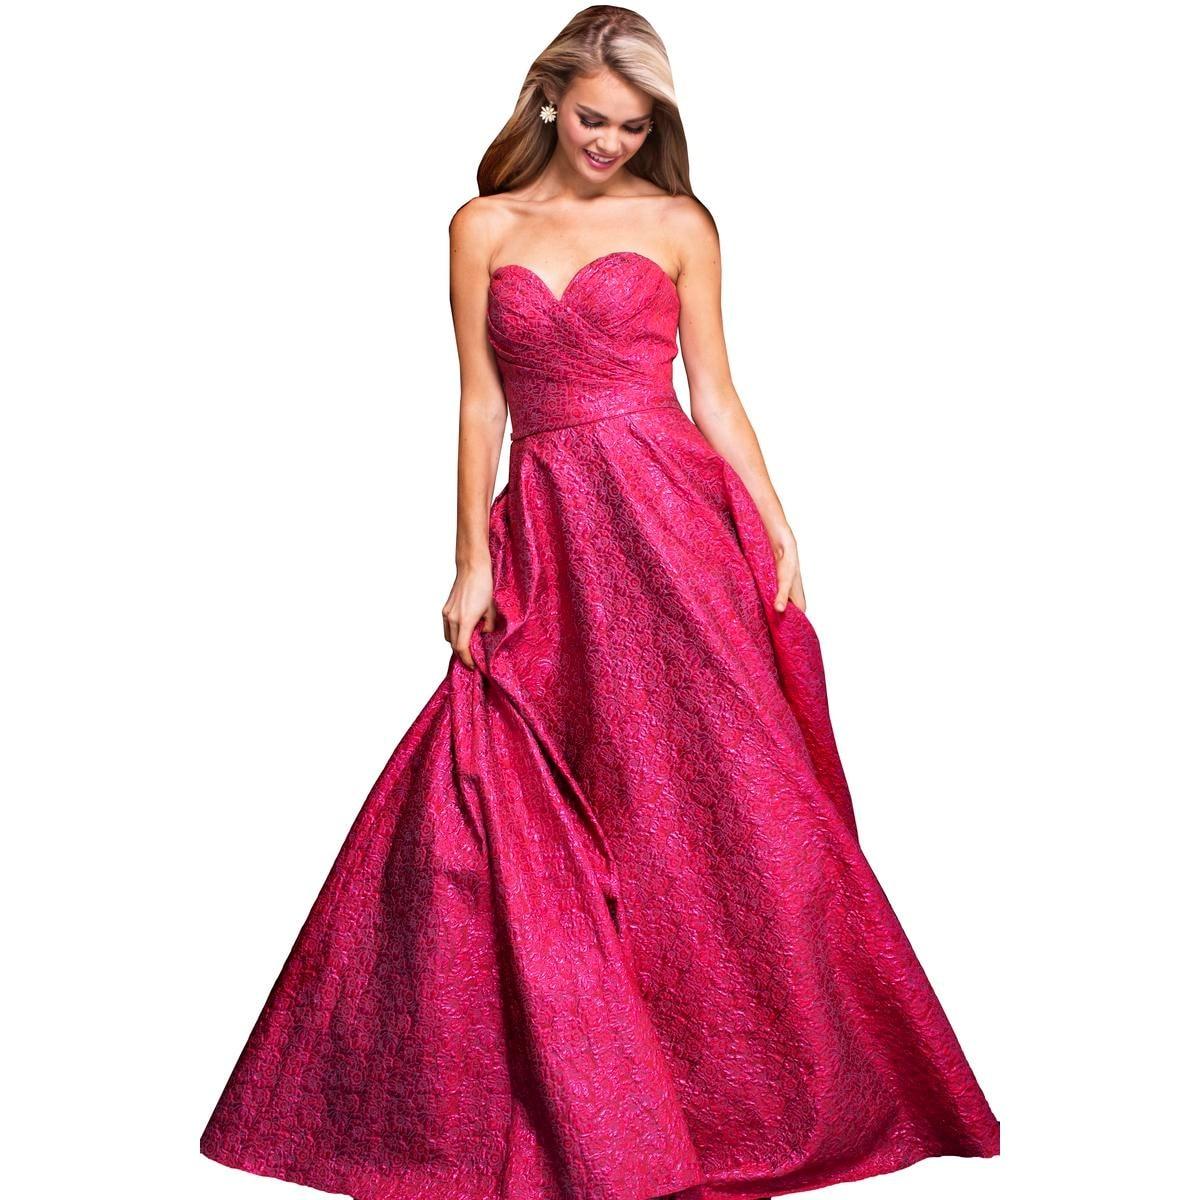 98575a2322b Jovani Red Evening Dresses - Data Dynamic AG